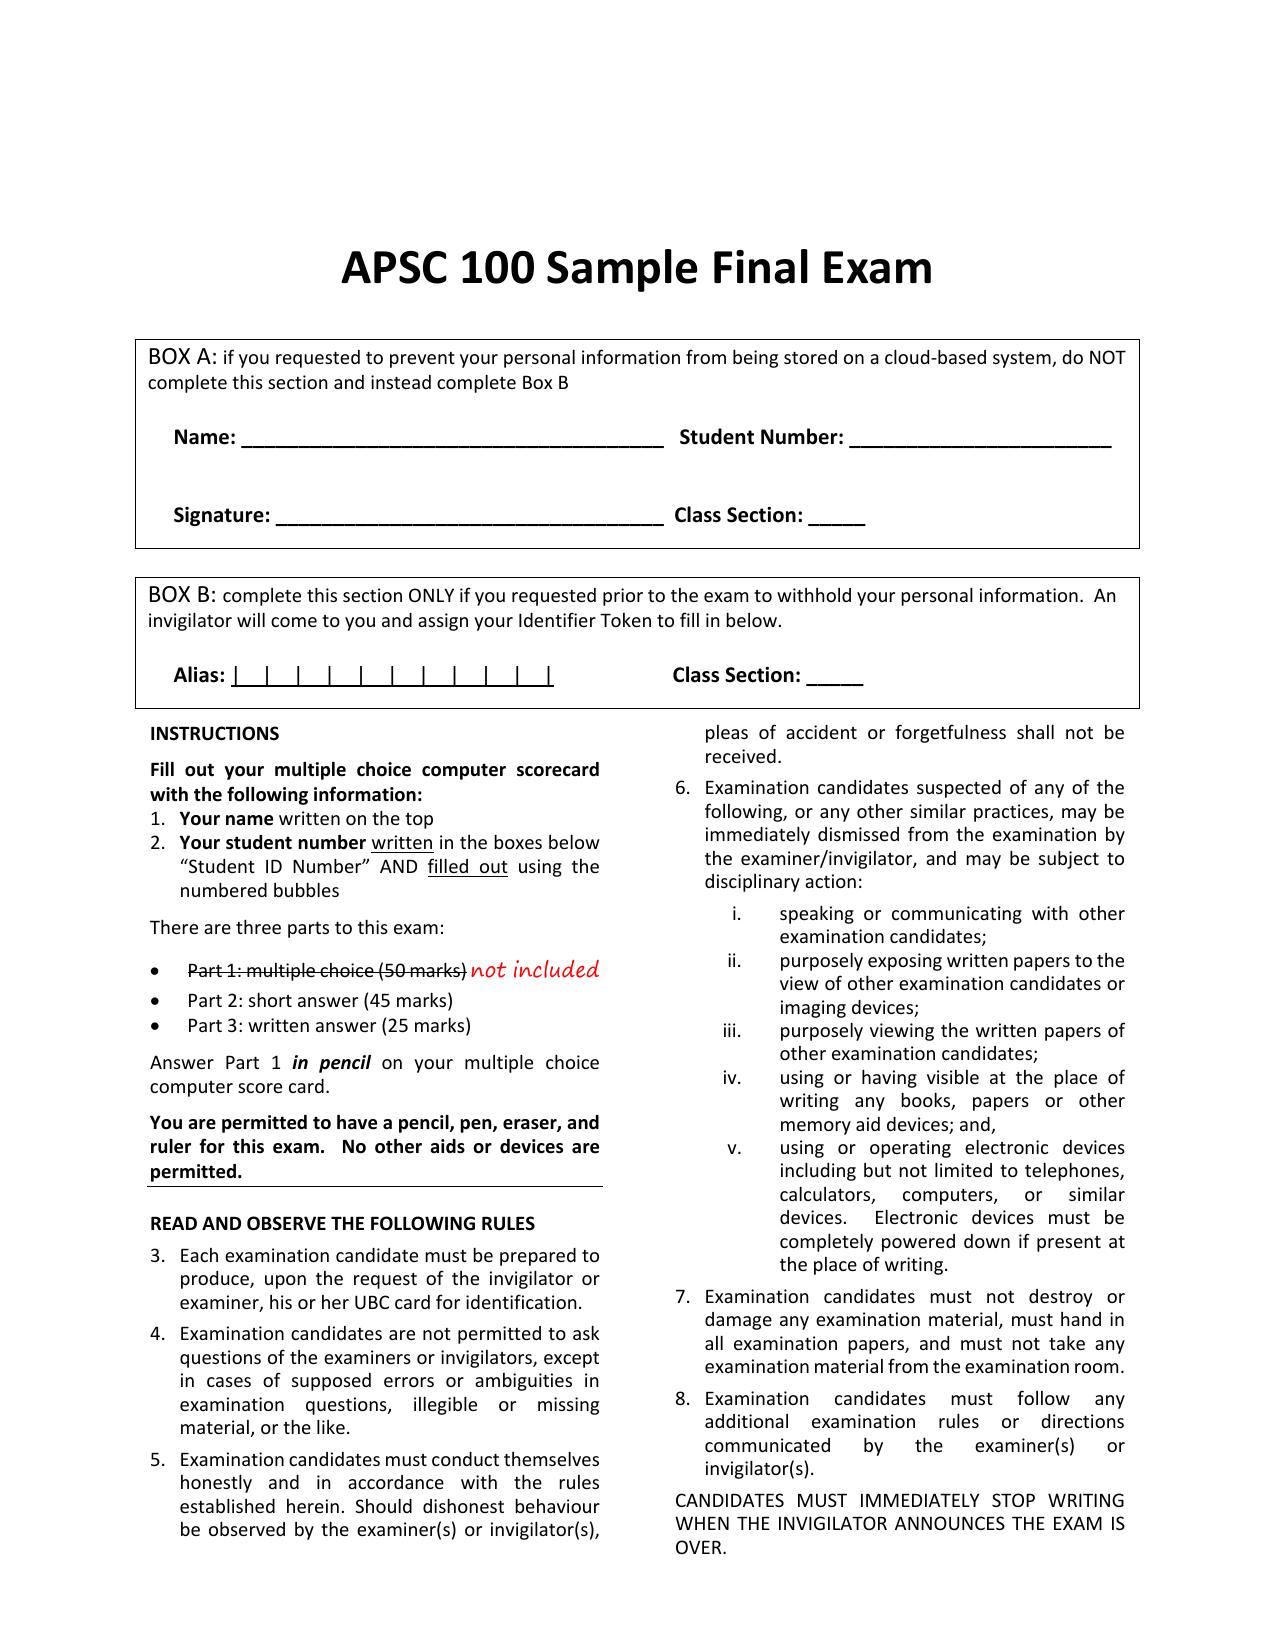 UBC - APSC 100 Sample Final Exam - Winter 2018